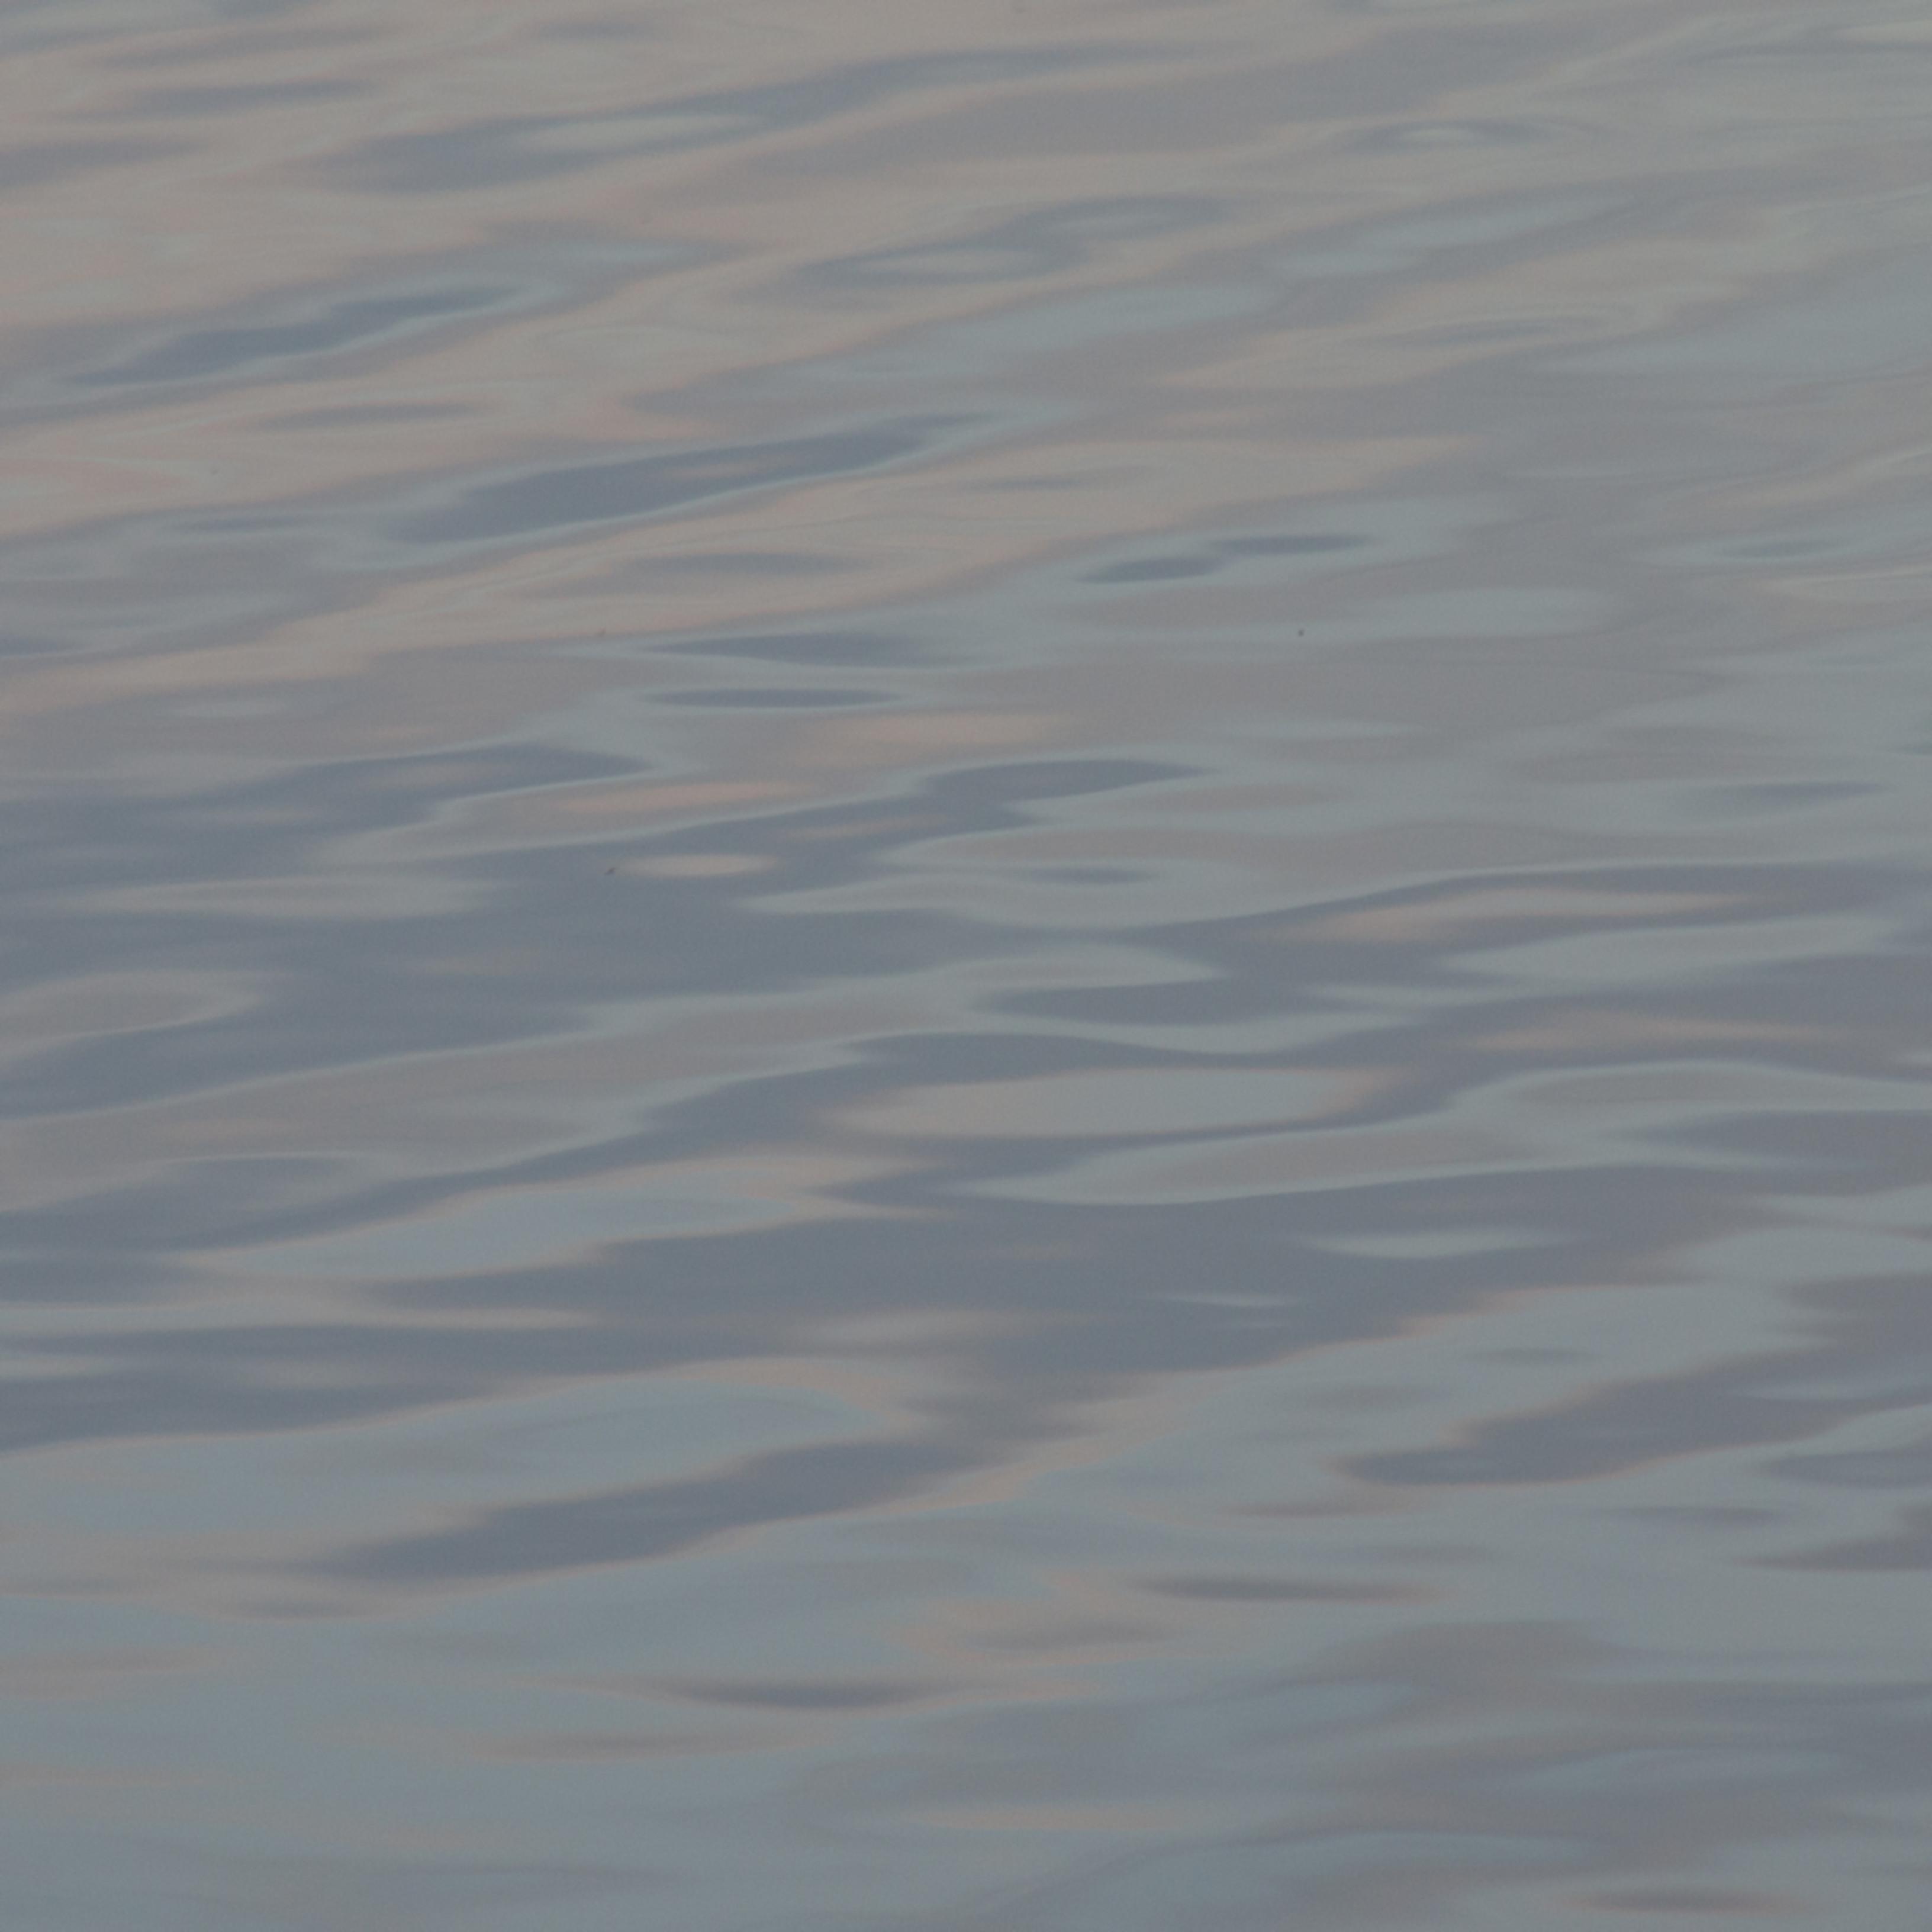 Lakewave2 hc2cjb